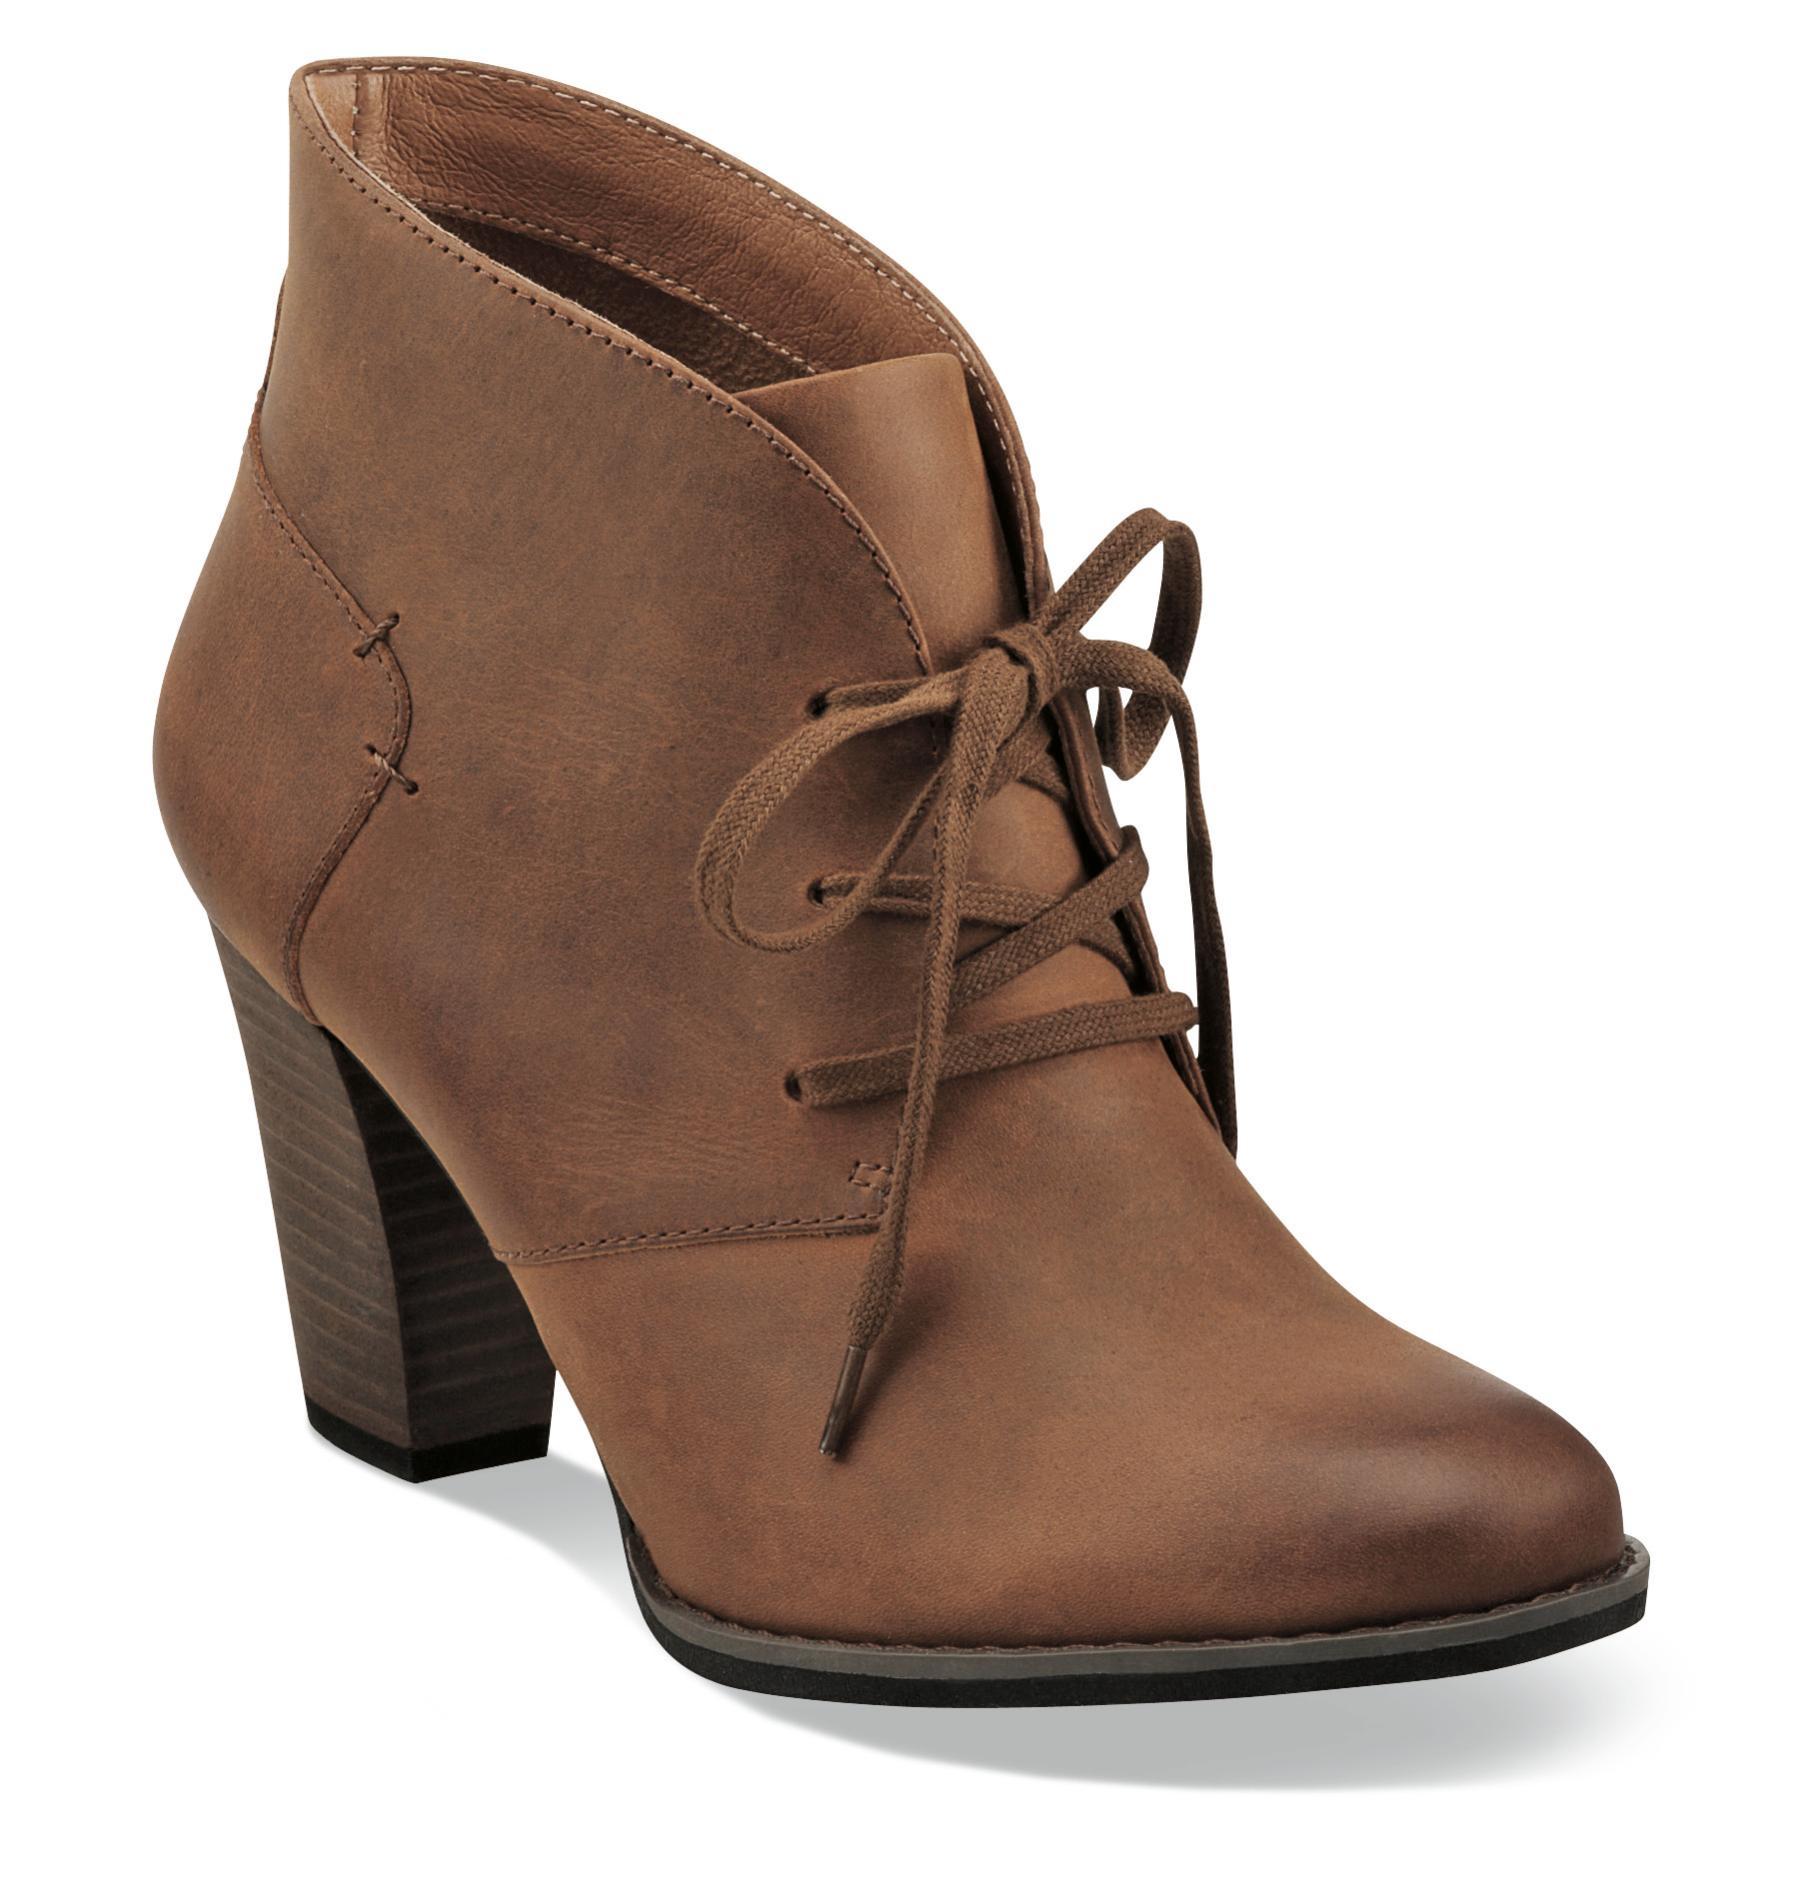 Clarks Shoes Wmens